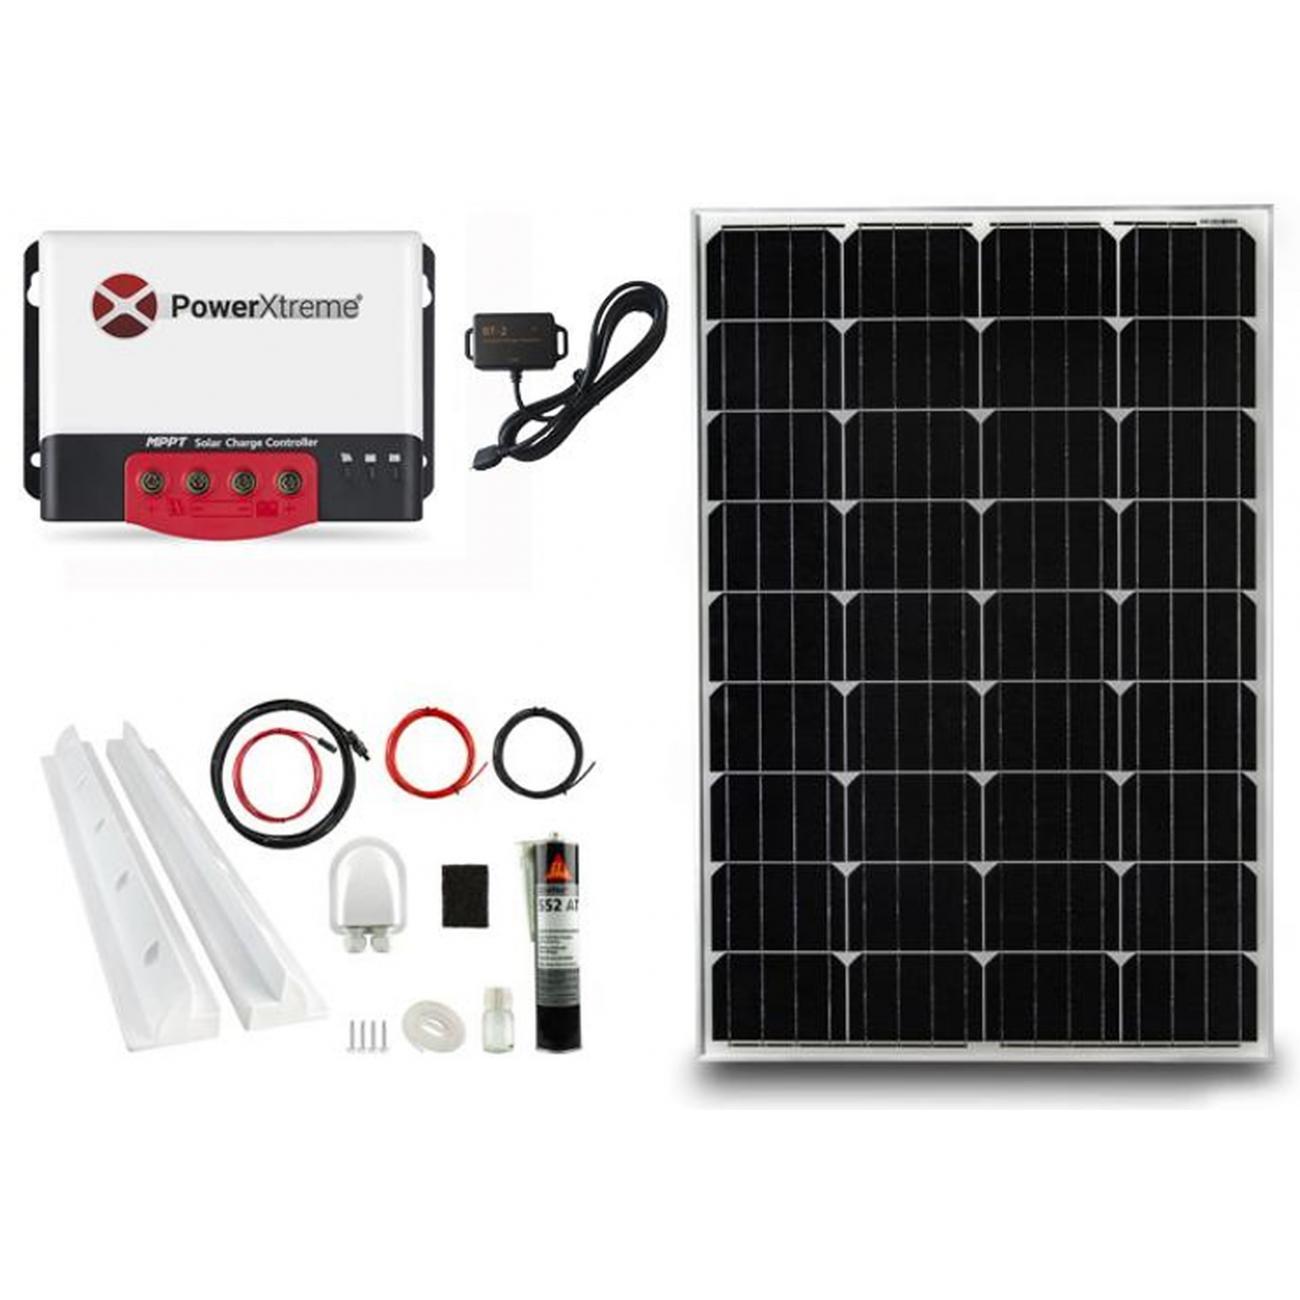 PowerXtreme XS20s Solar MPPT Met Bluetooth 130W Pakket